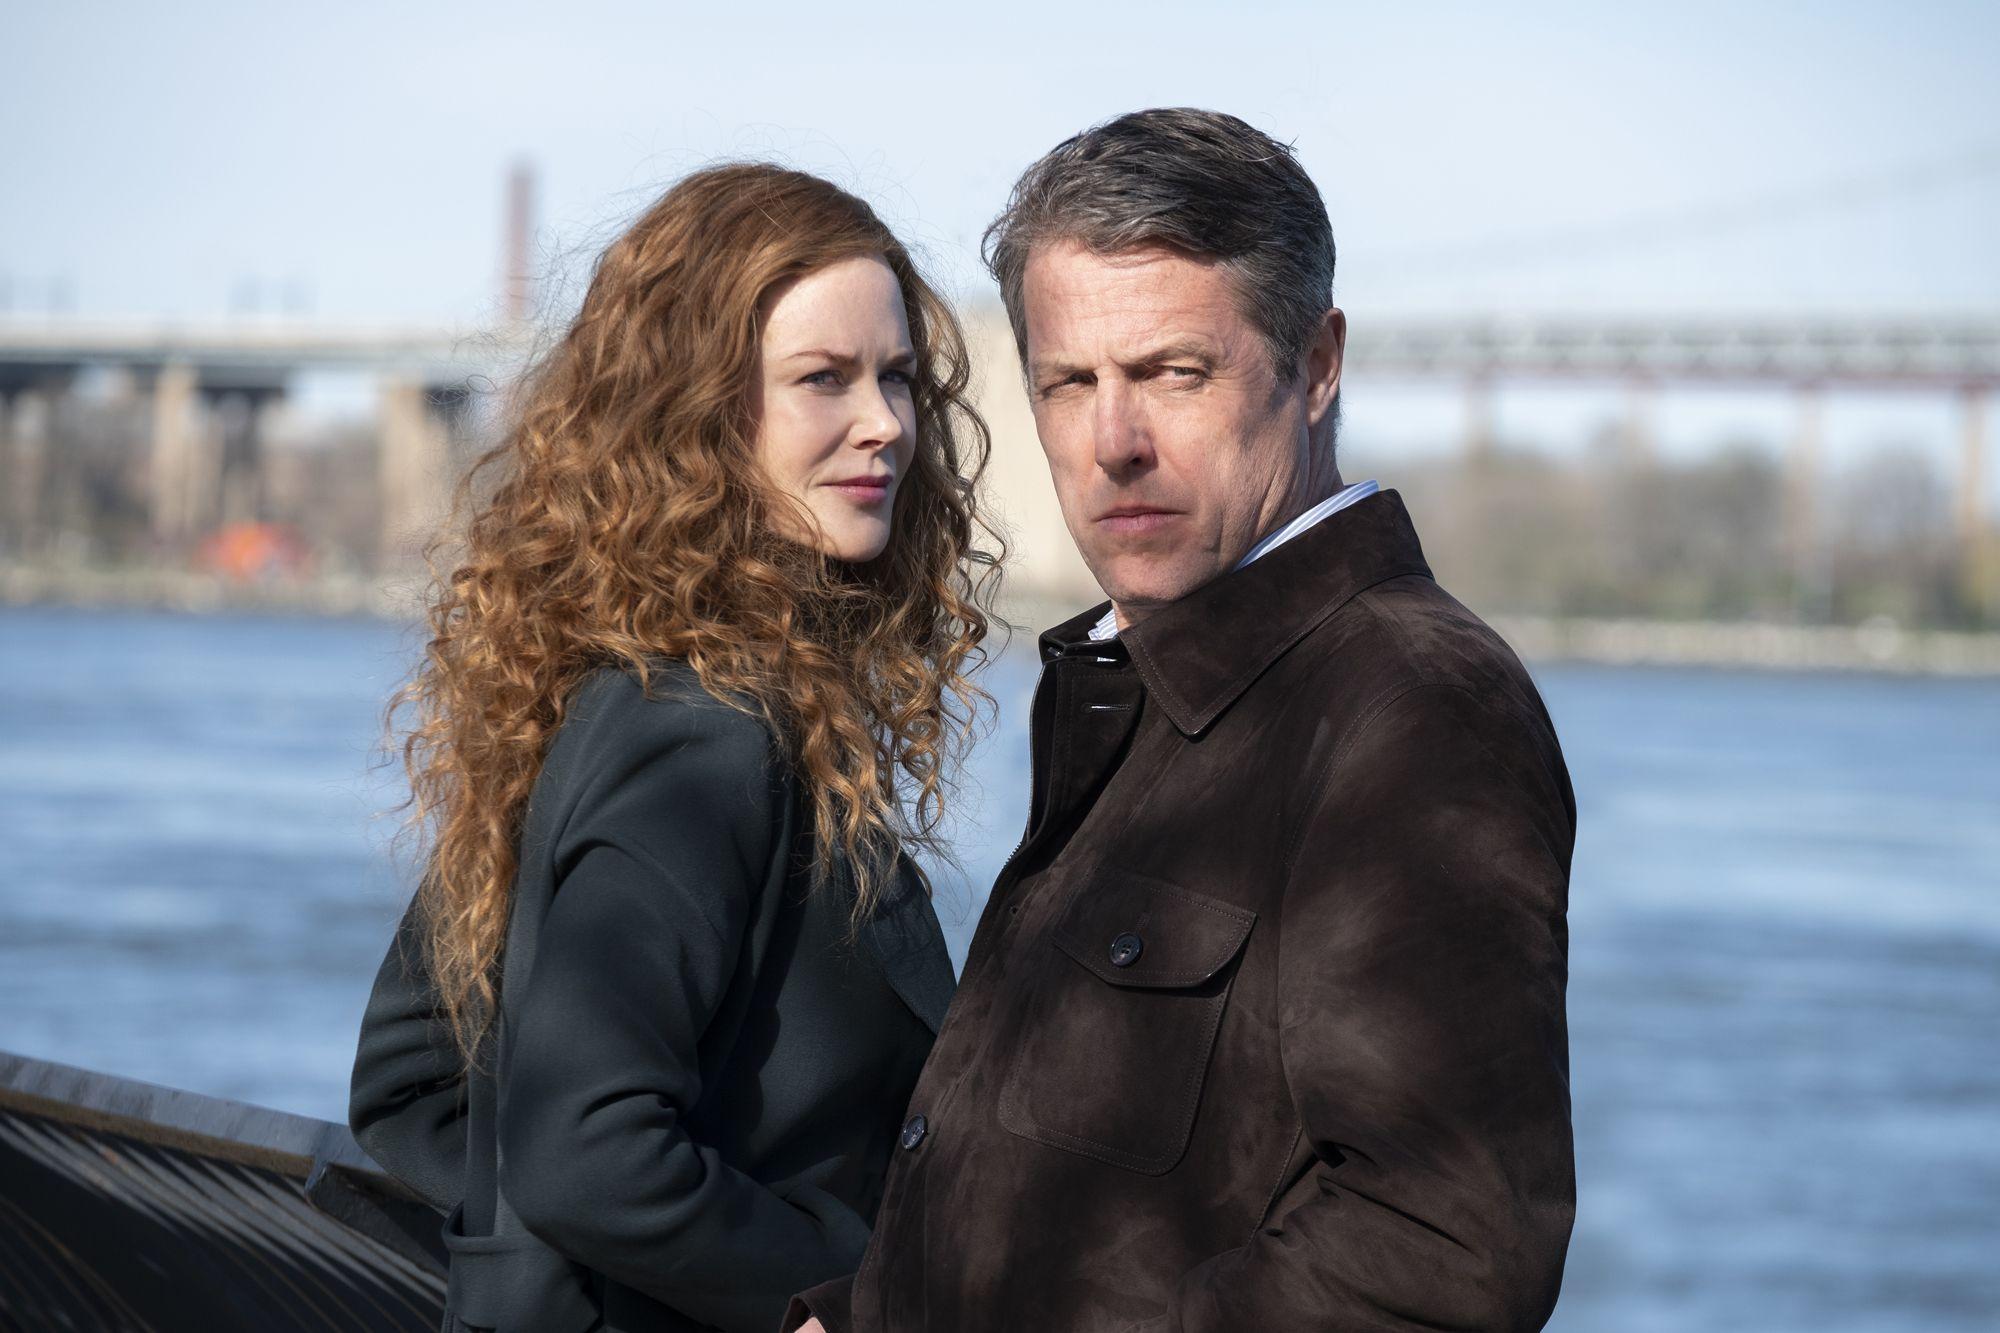 Serie Tv 2021 Undoing con Nicole Kidman e Hugh Grant